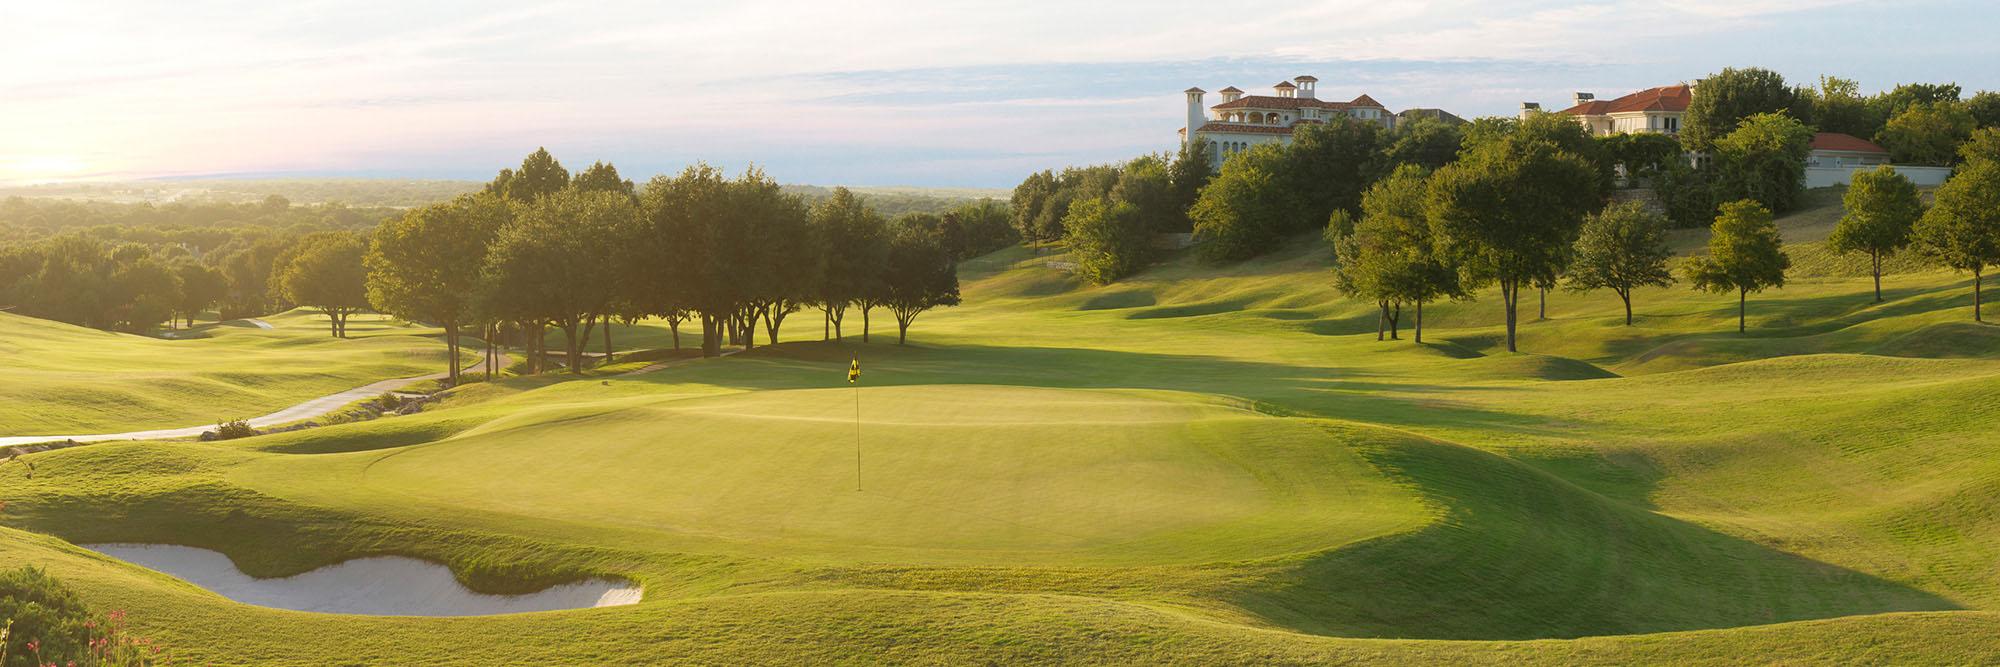 Golf Course Image - Mira Vista No. 18